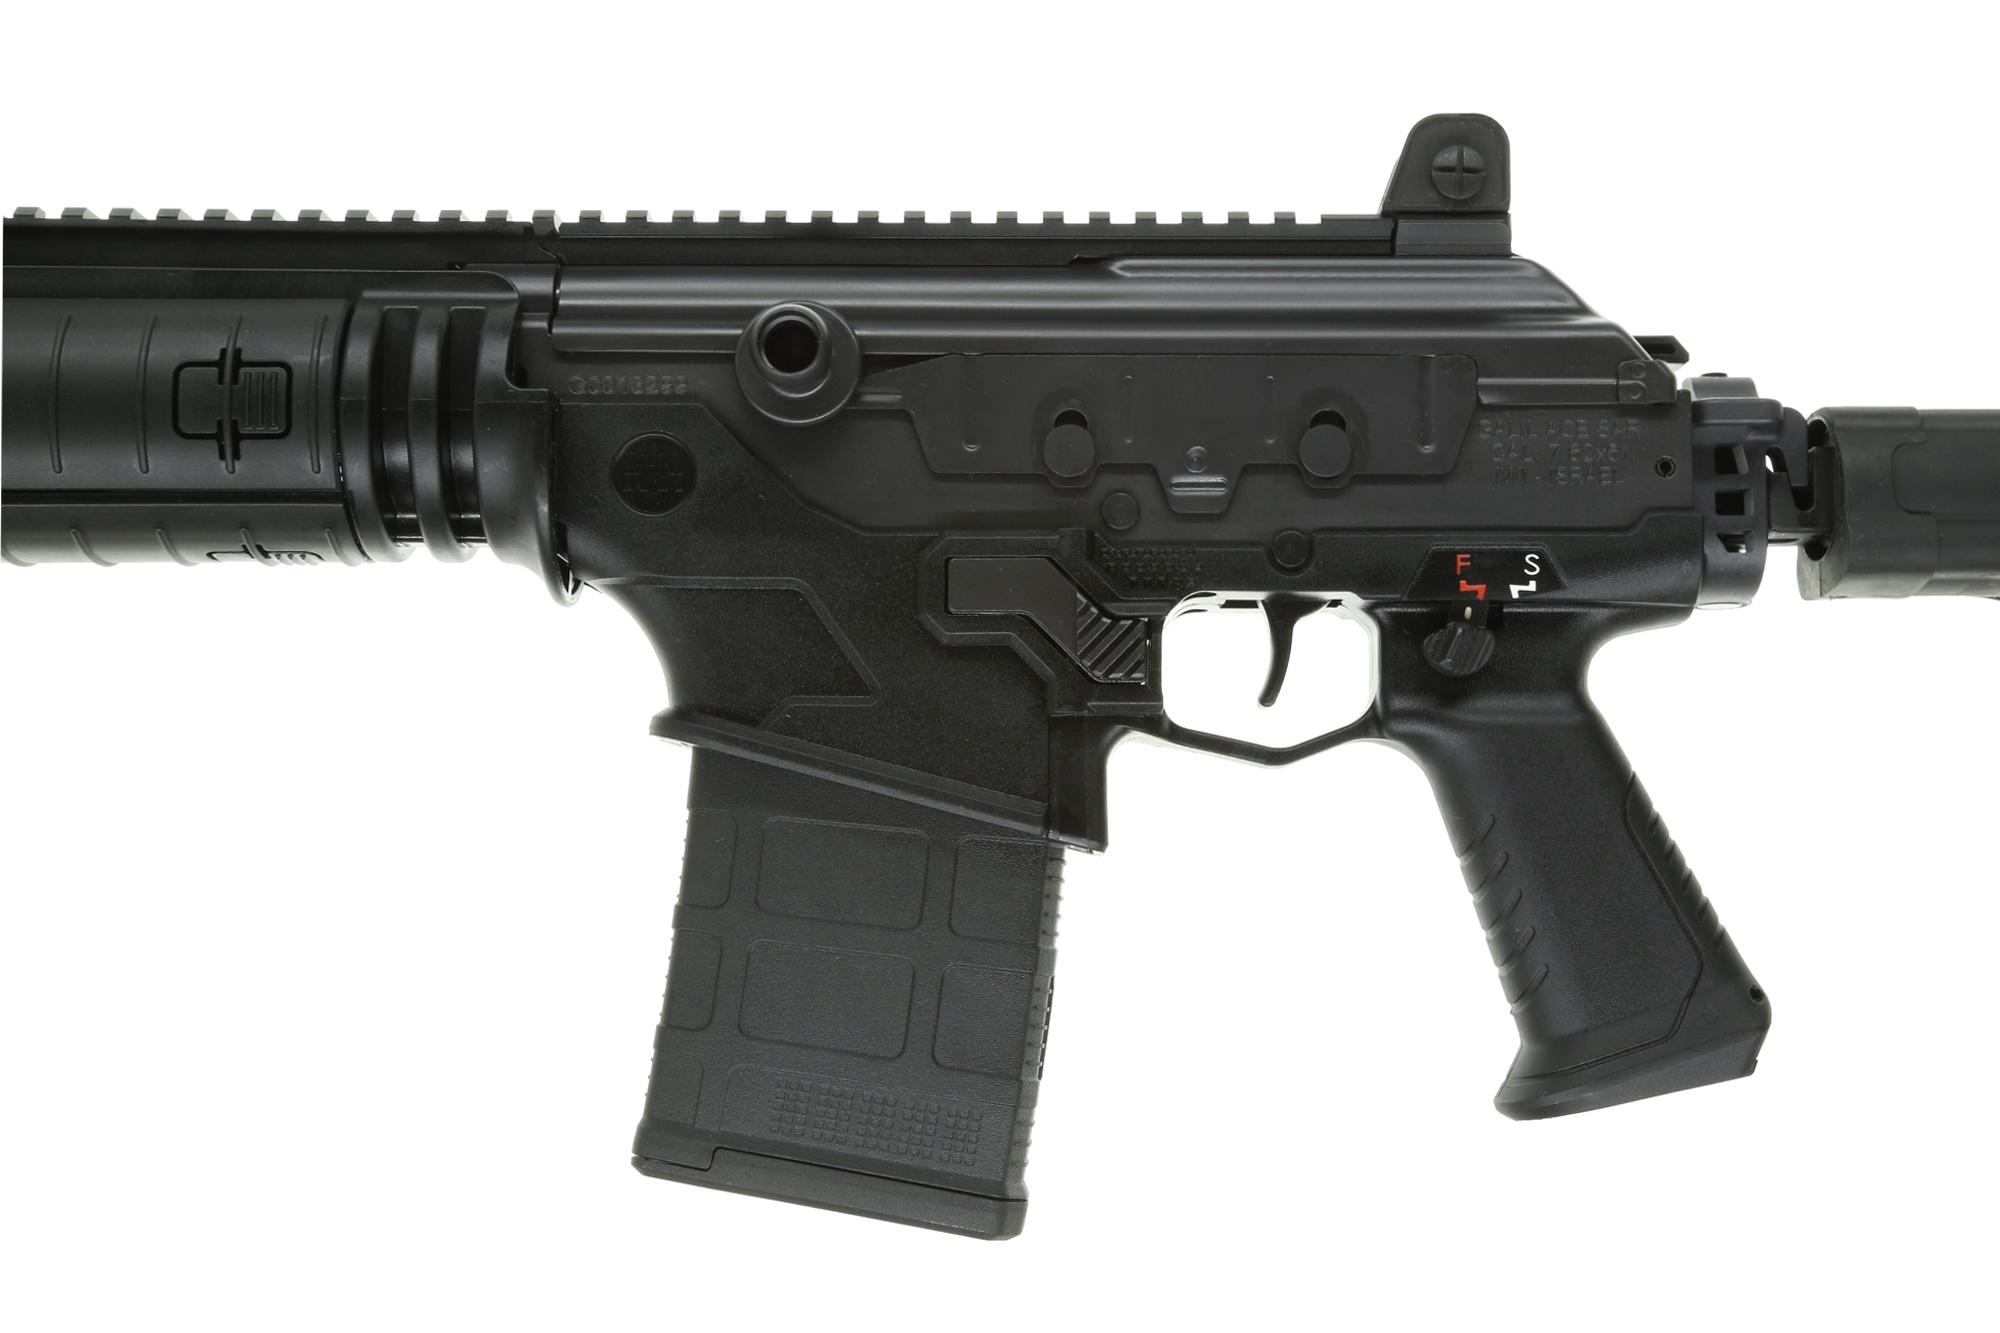 IWI Galil ACE - Galil ACE 7 62 NATO 11 8'' barrel Pistol w/ Side Folding  Stabilizing Brace GAP51SB